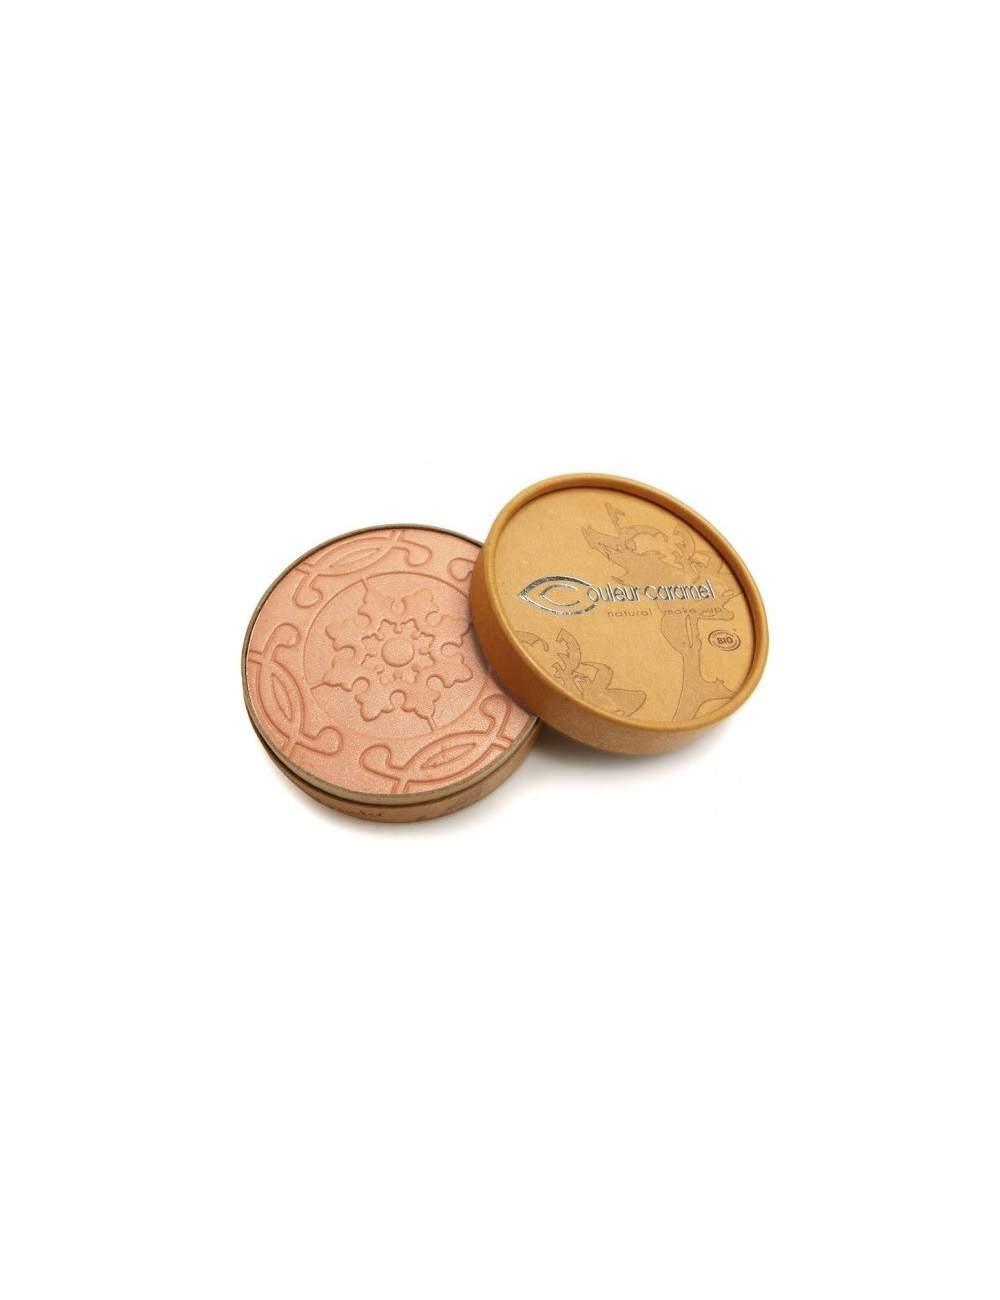 Poudres Bronzantes Bio Nacrés Terre Caramel 22 Orange Brown. Couleur Caramel